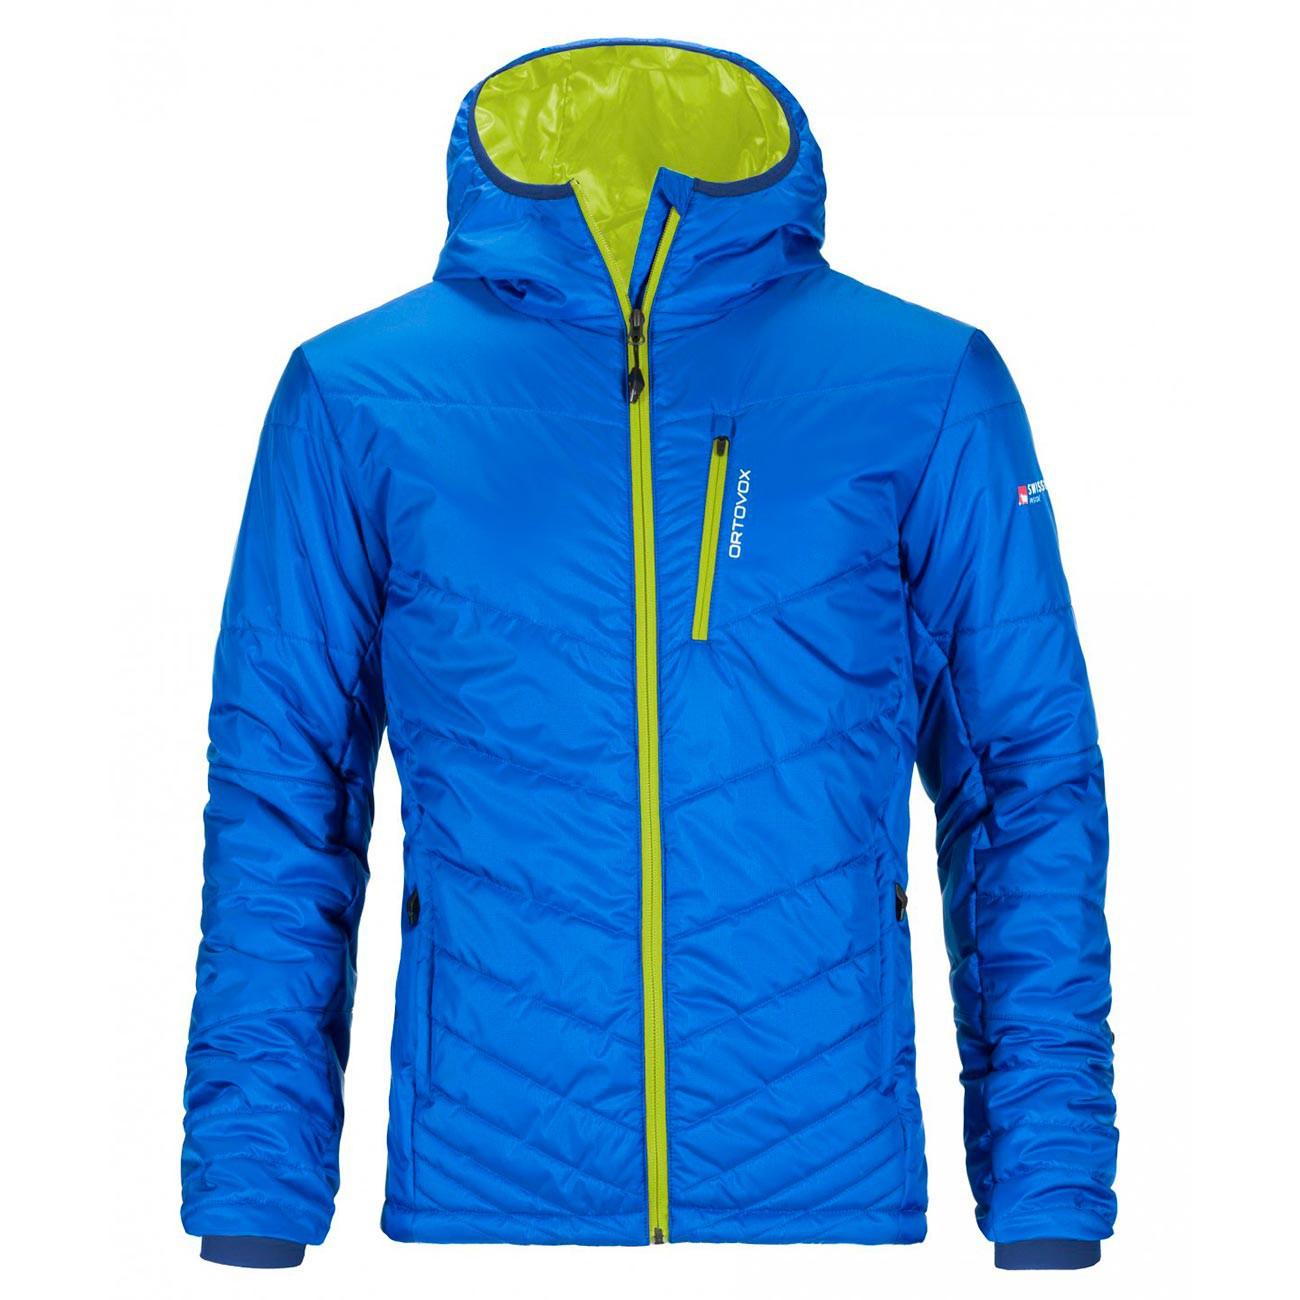 Ortovox Piz Bianco Jacket blue ocean